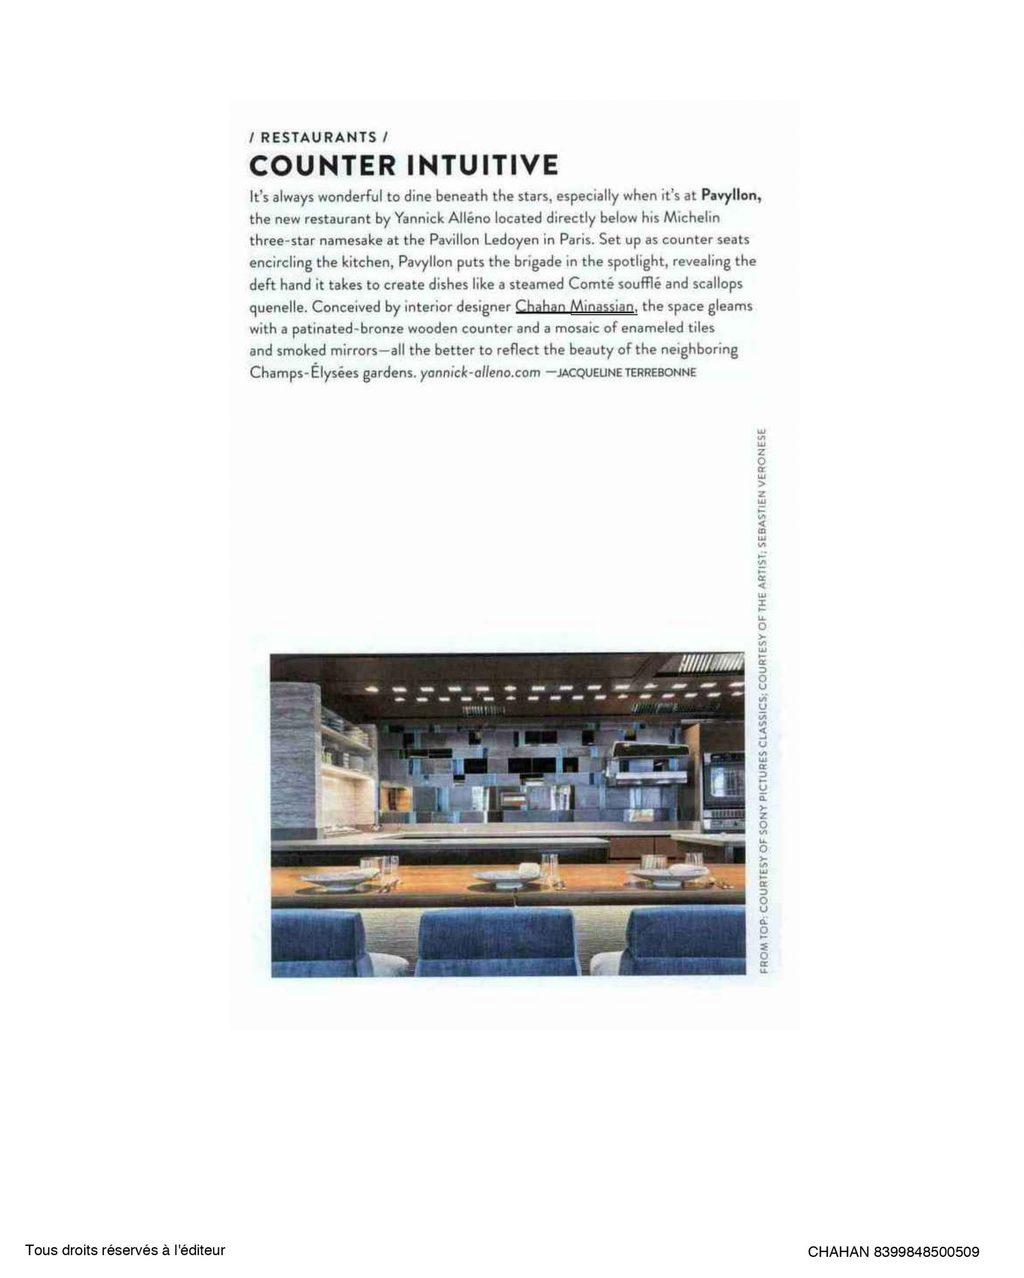 galerie-magazine-scaled